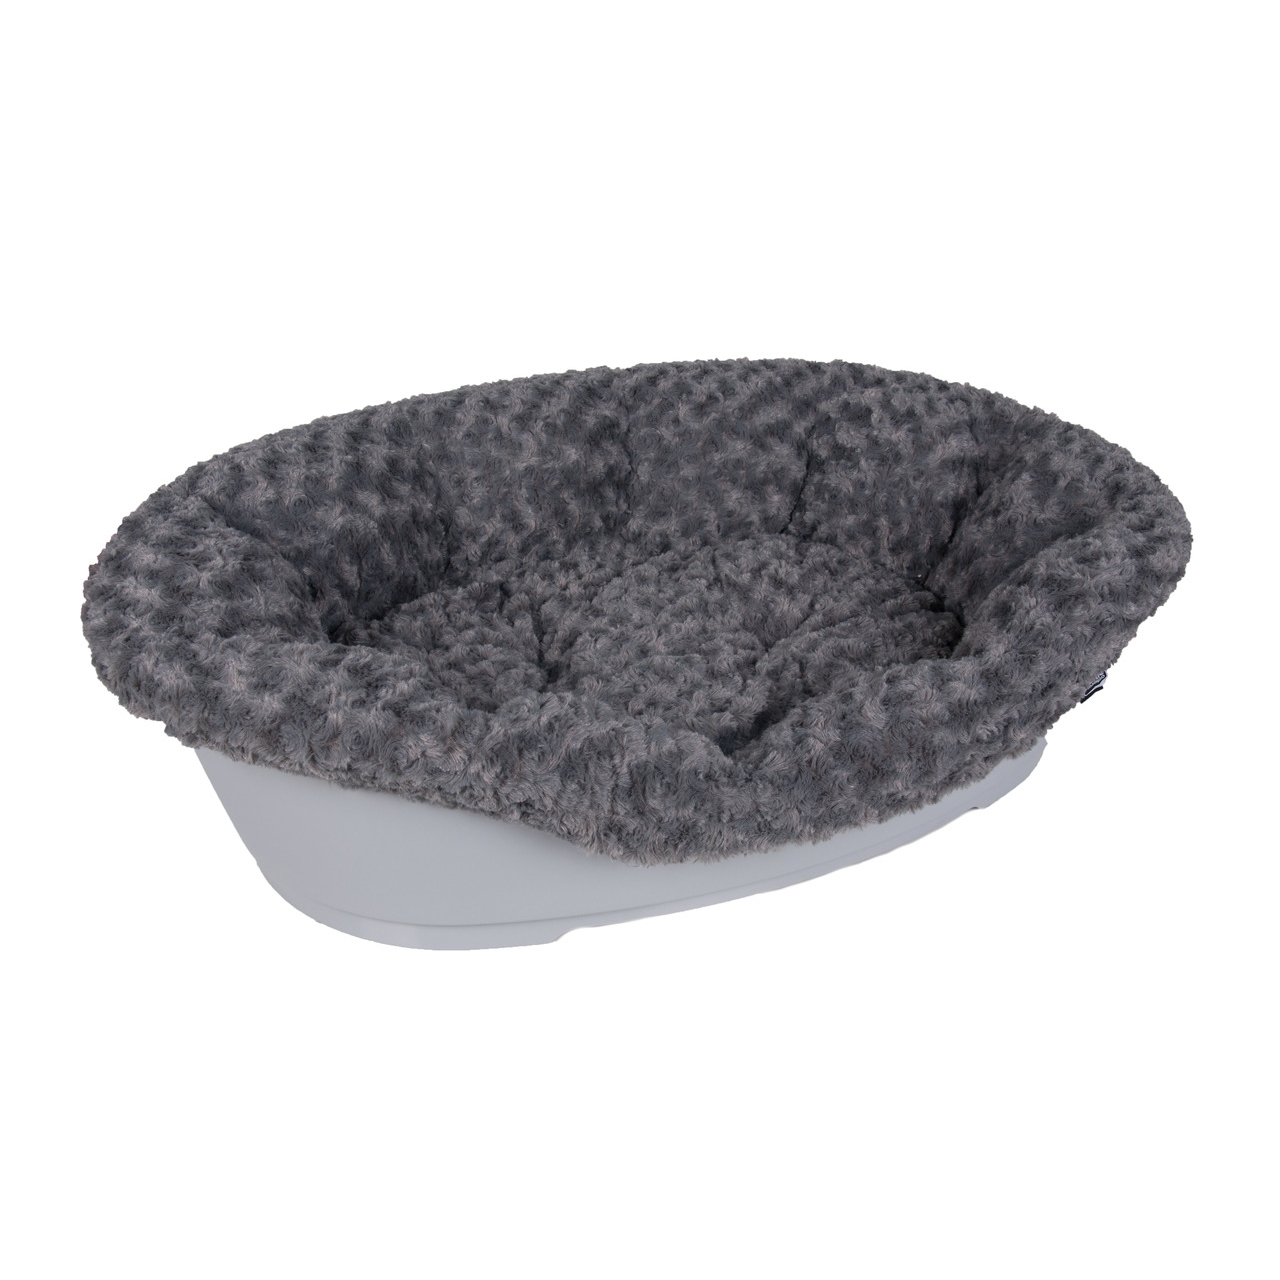 Karlie Hundekorb Kunststoff Bezug Cuddly, für 95 cm Korb, grau, nur Bezug, ohne Korb